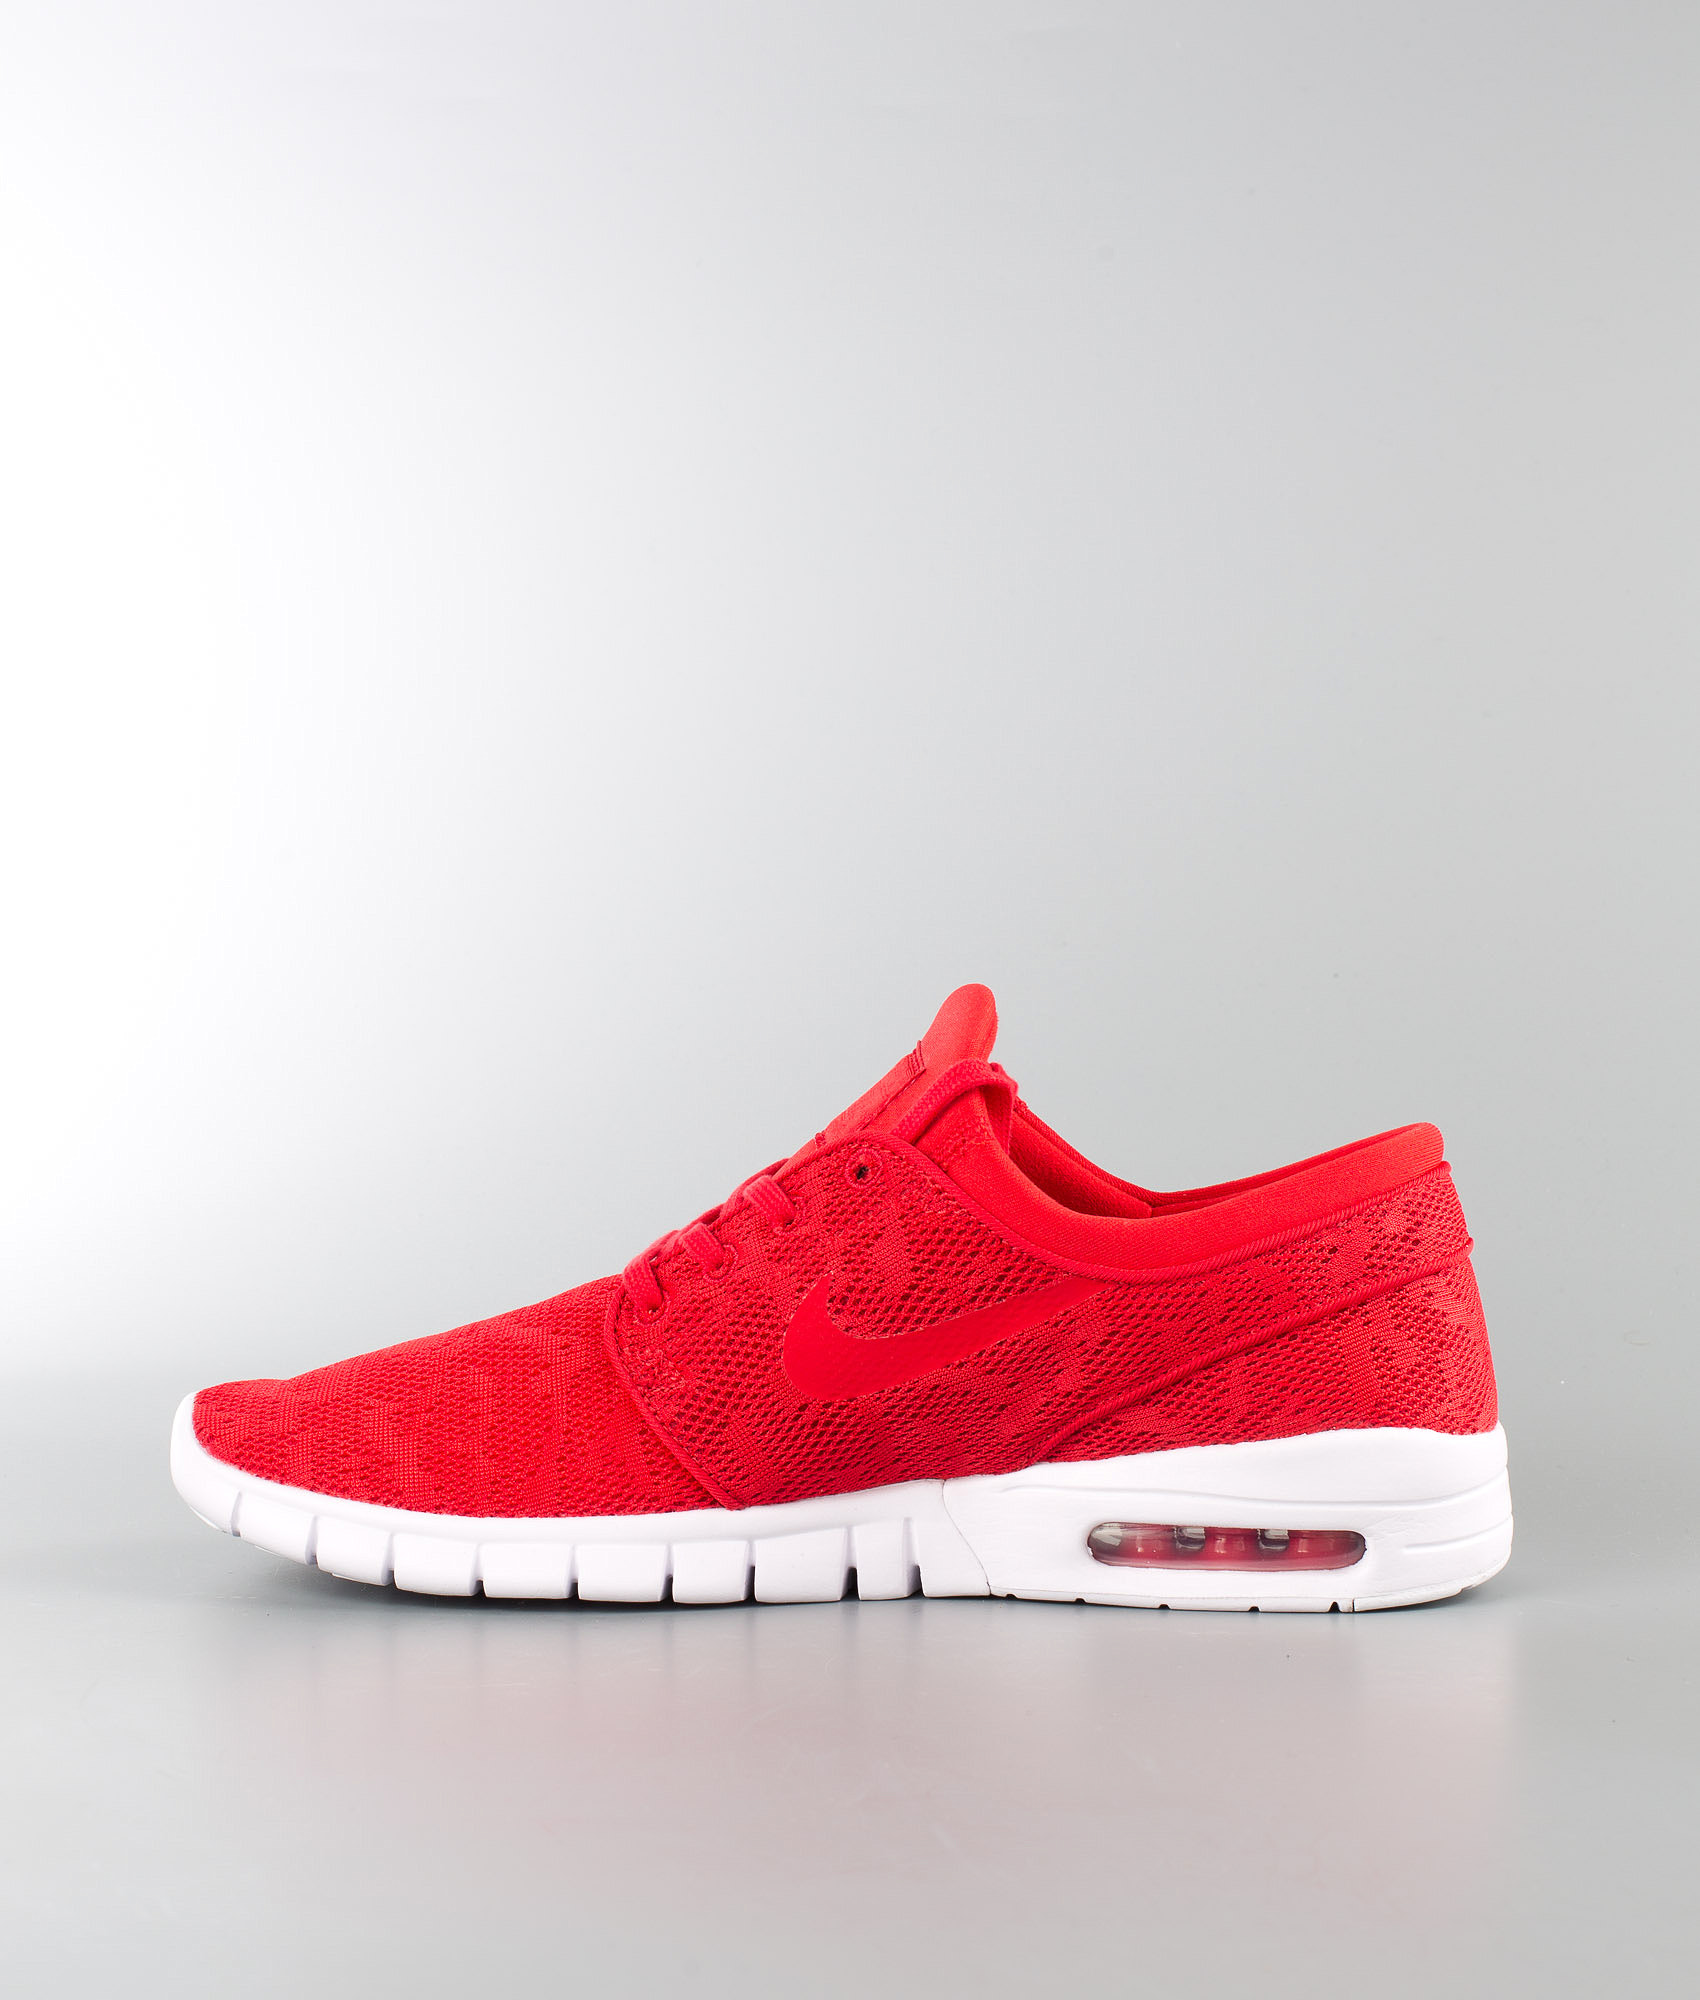 2dcb839e72 Nike Stefan Janoski Max Shoes University Red/University Red-White ...